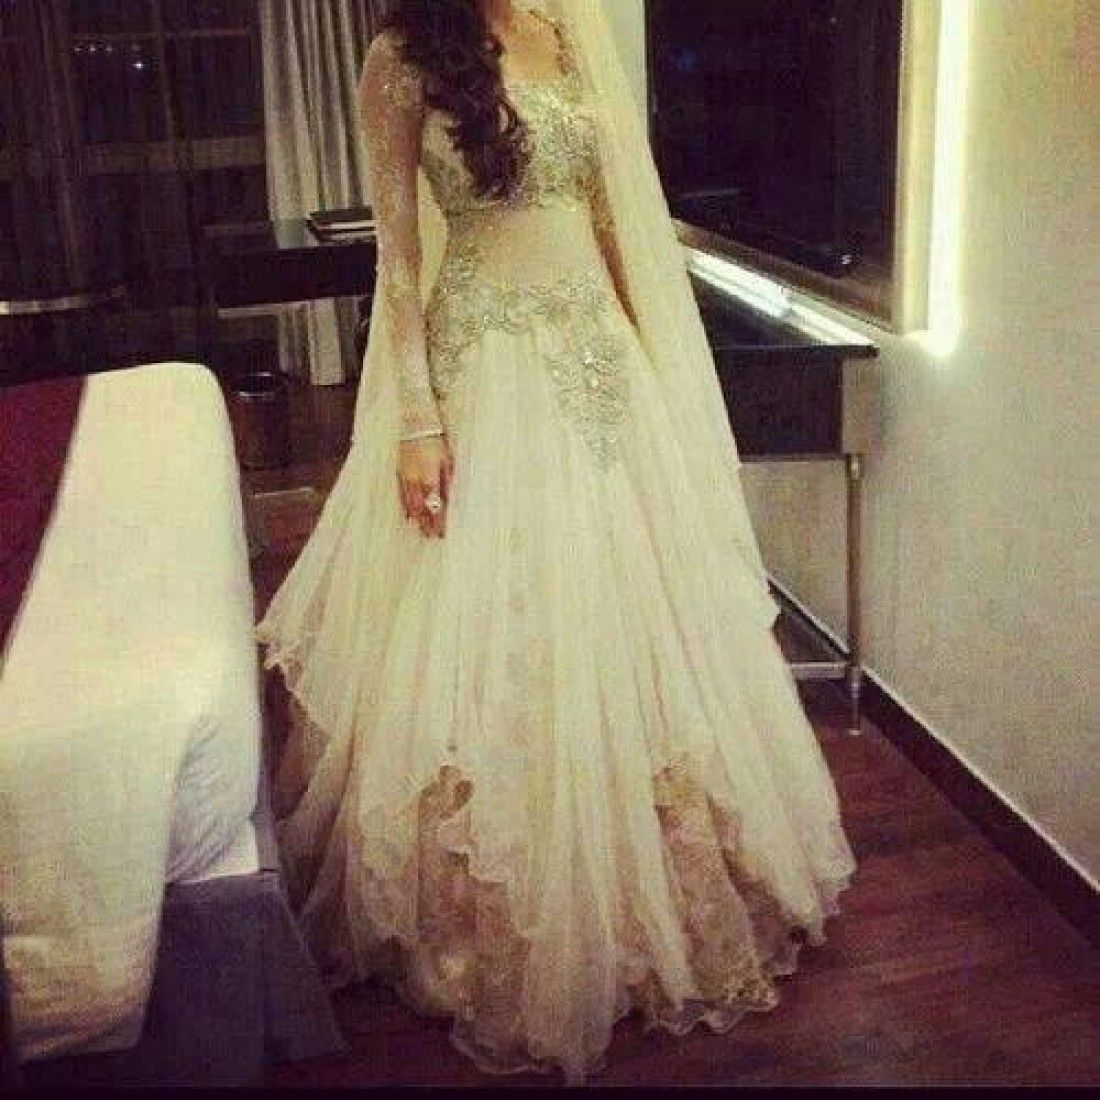 Indian Fusion Wedding Attire | Wedding fusion ideas | Pinterest